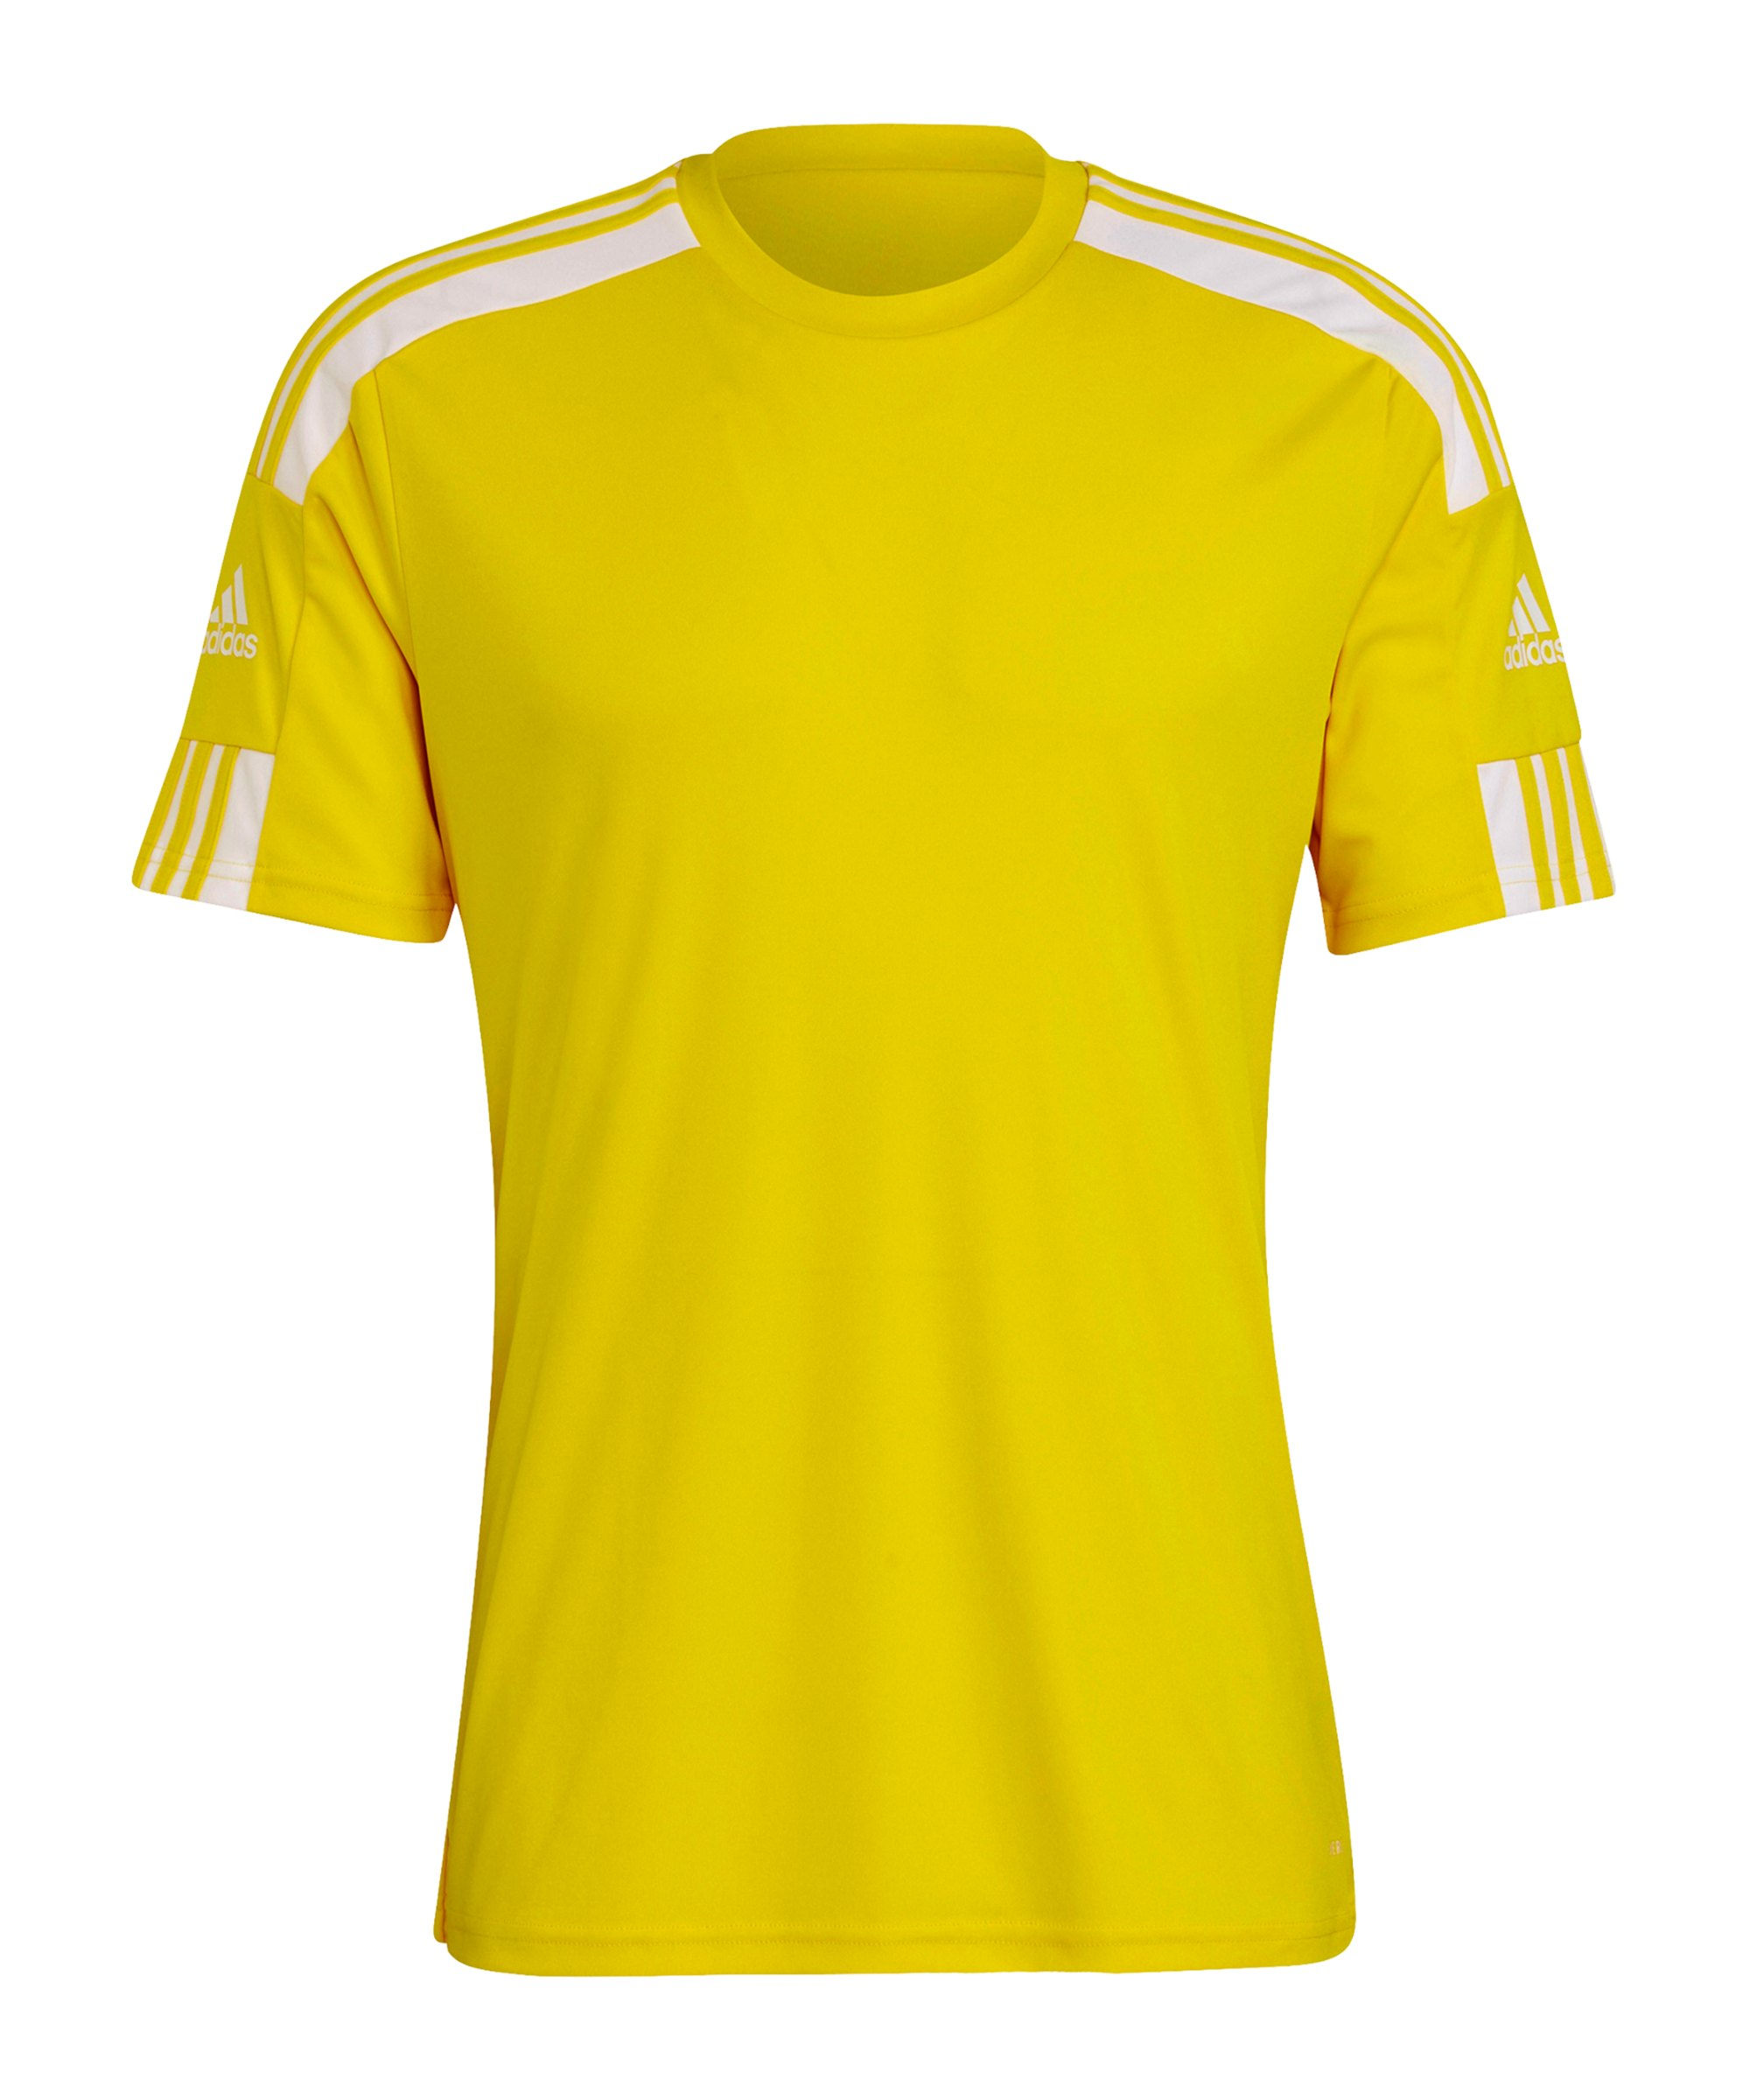 adidas Squadra 21 Trikot Gelb Weiss - gelb